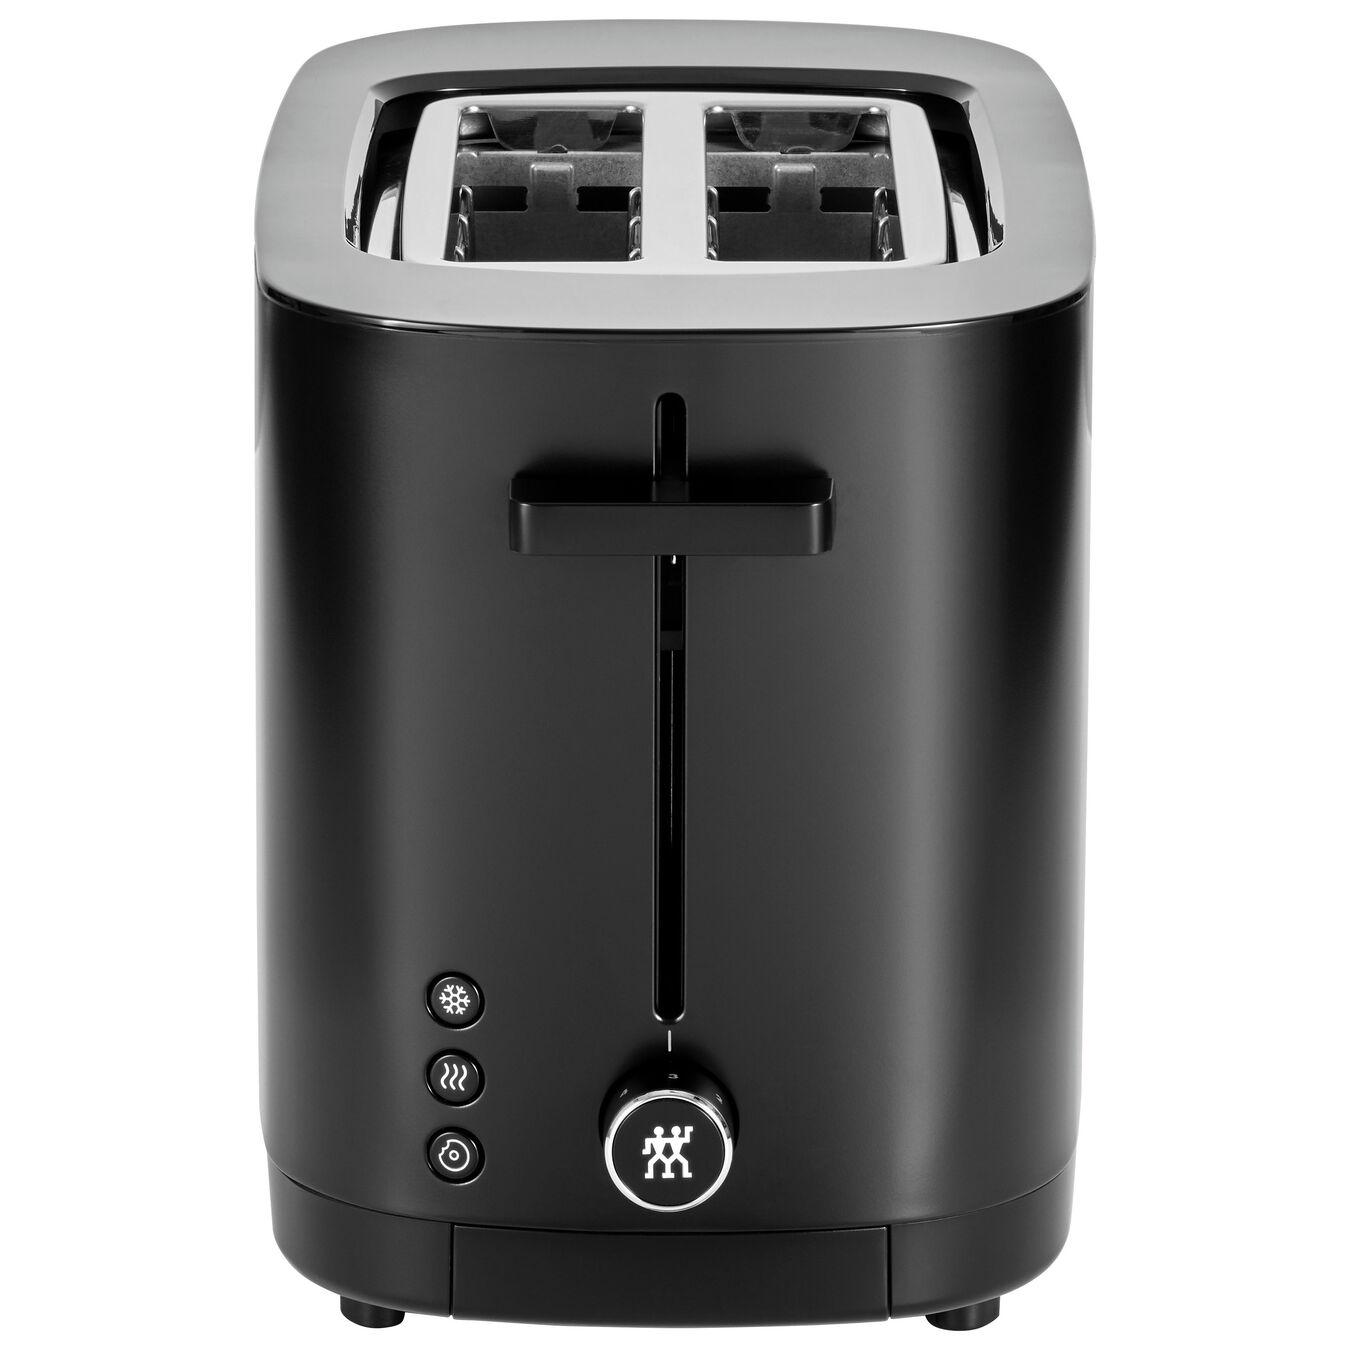 2 Slot Toaster - Black,,large 3